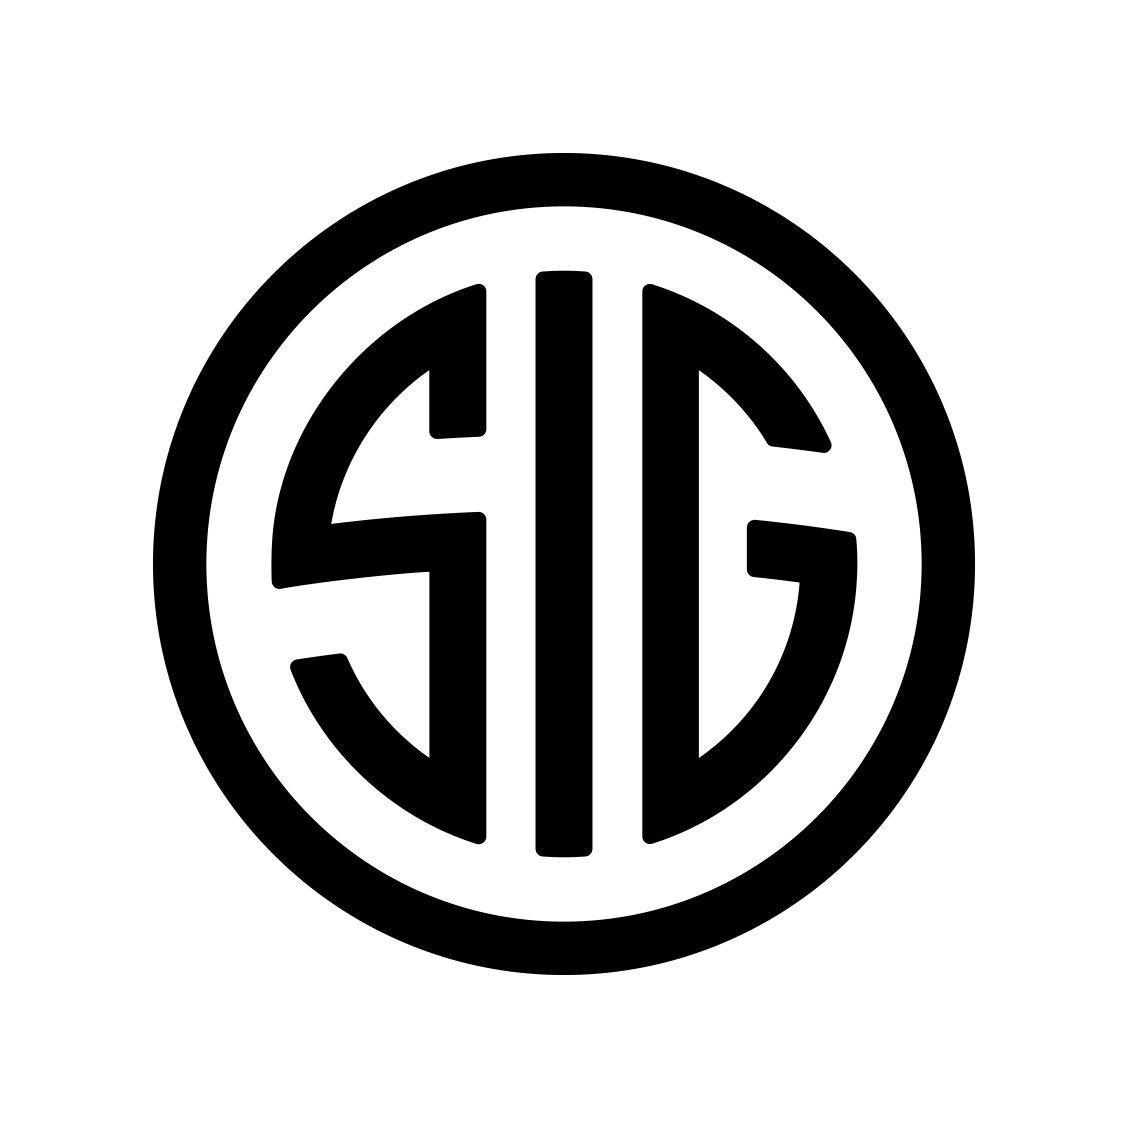 SIG SAUER, Inc. Files Patent Infringement Case Against Springfield, Inc.